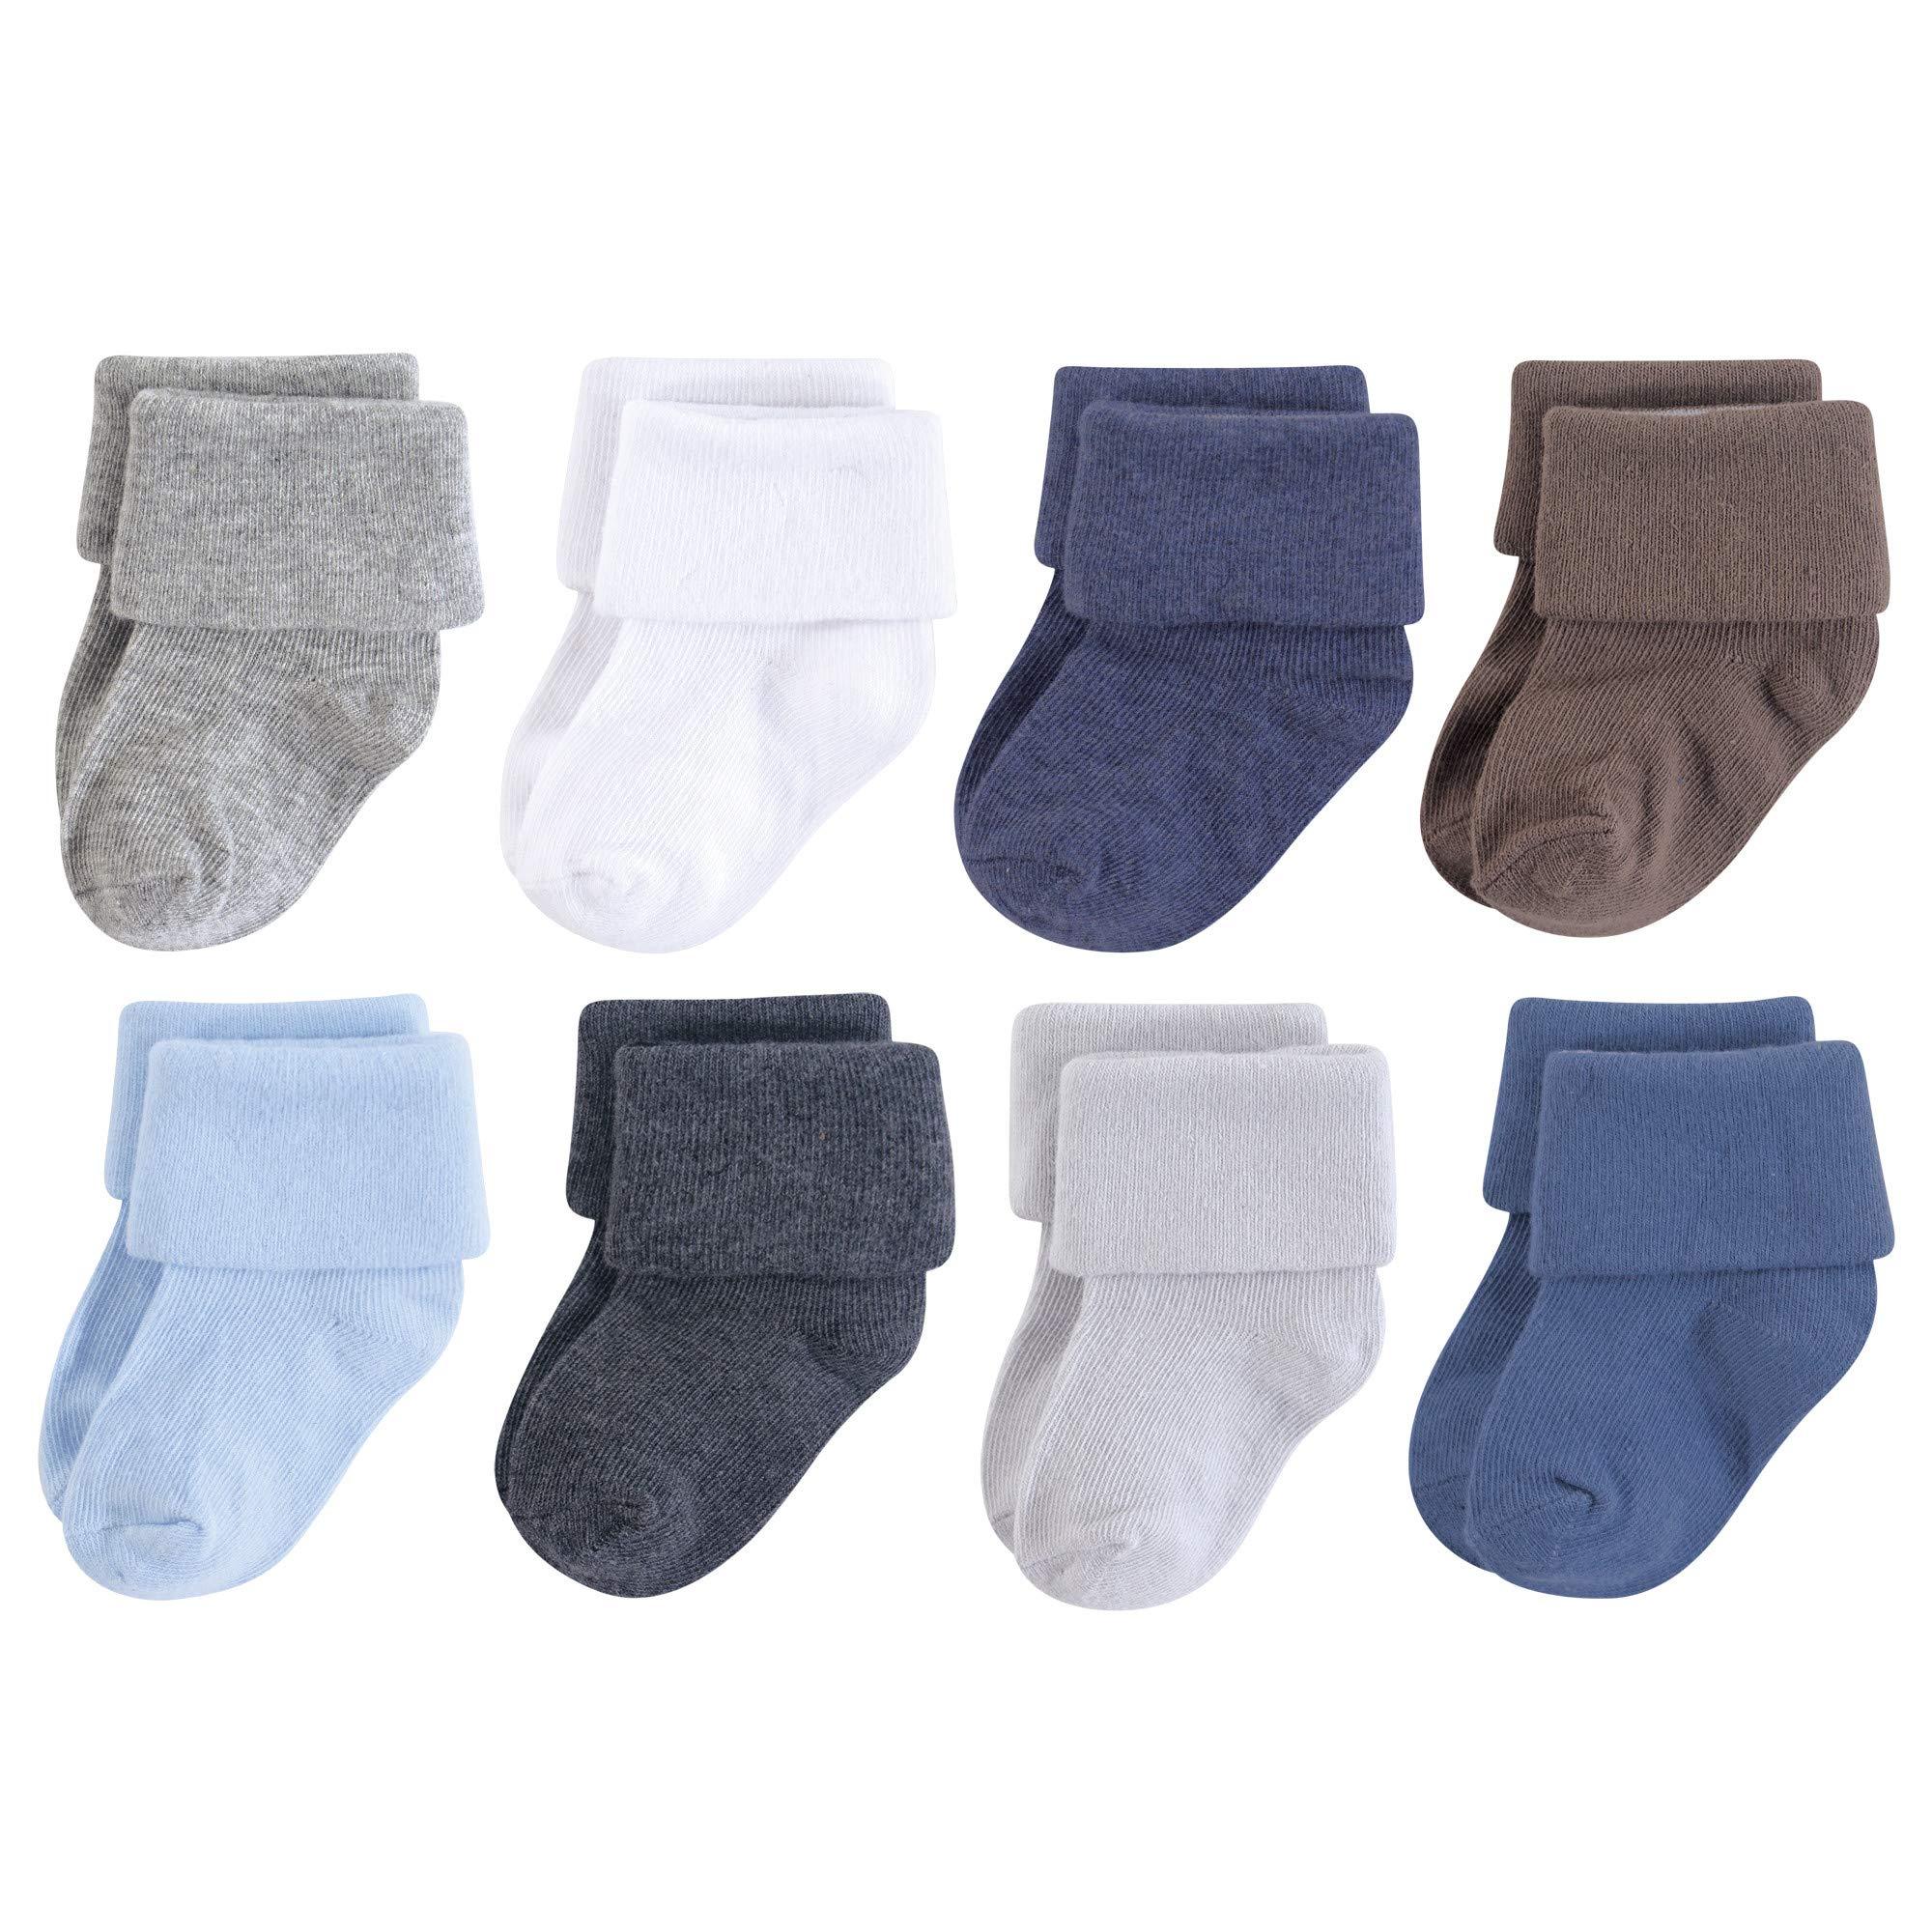 Luvable Friends Baby Basic Socks, Blue Charcoal